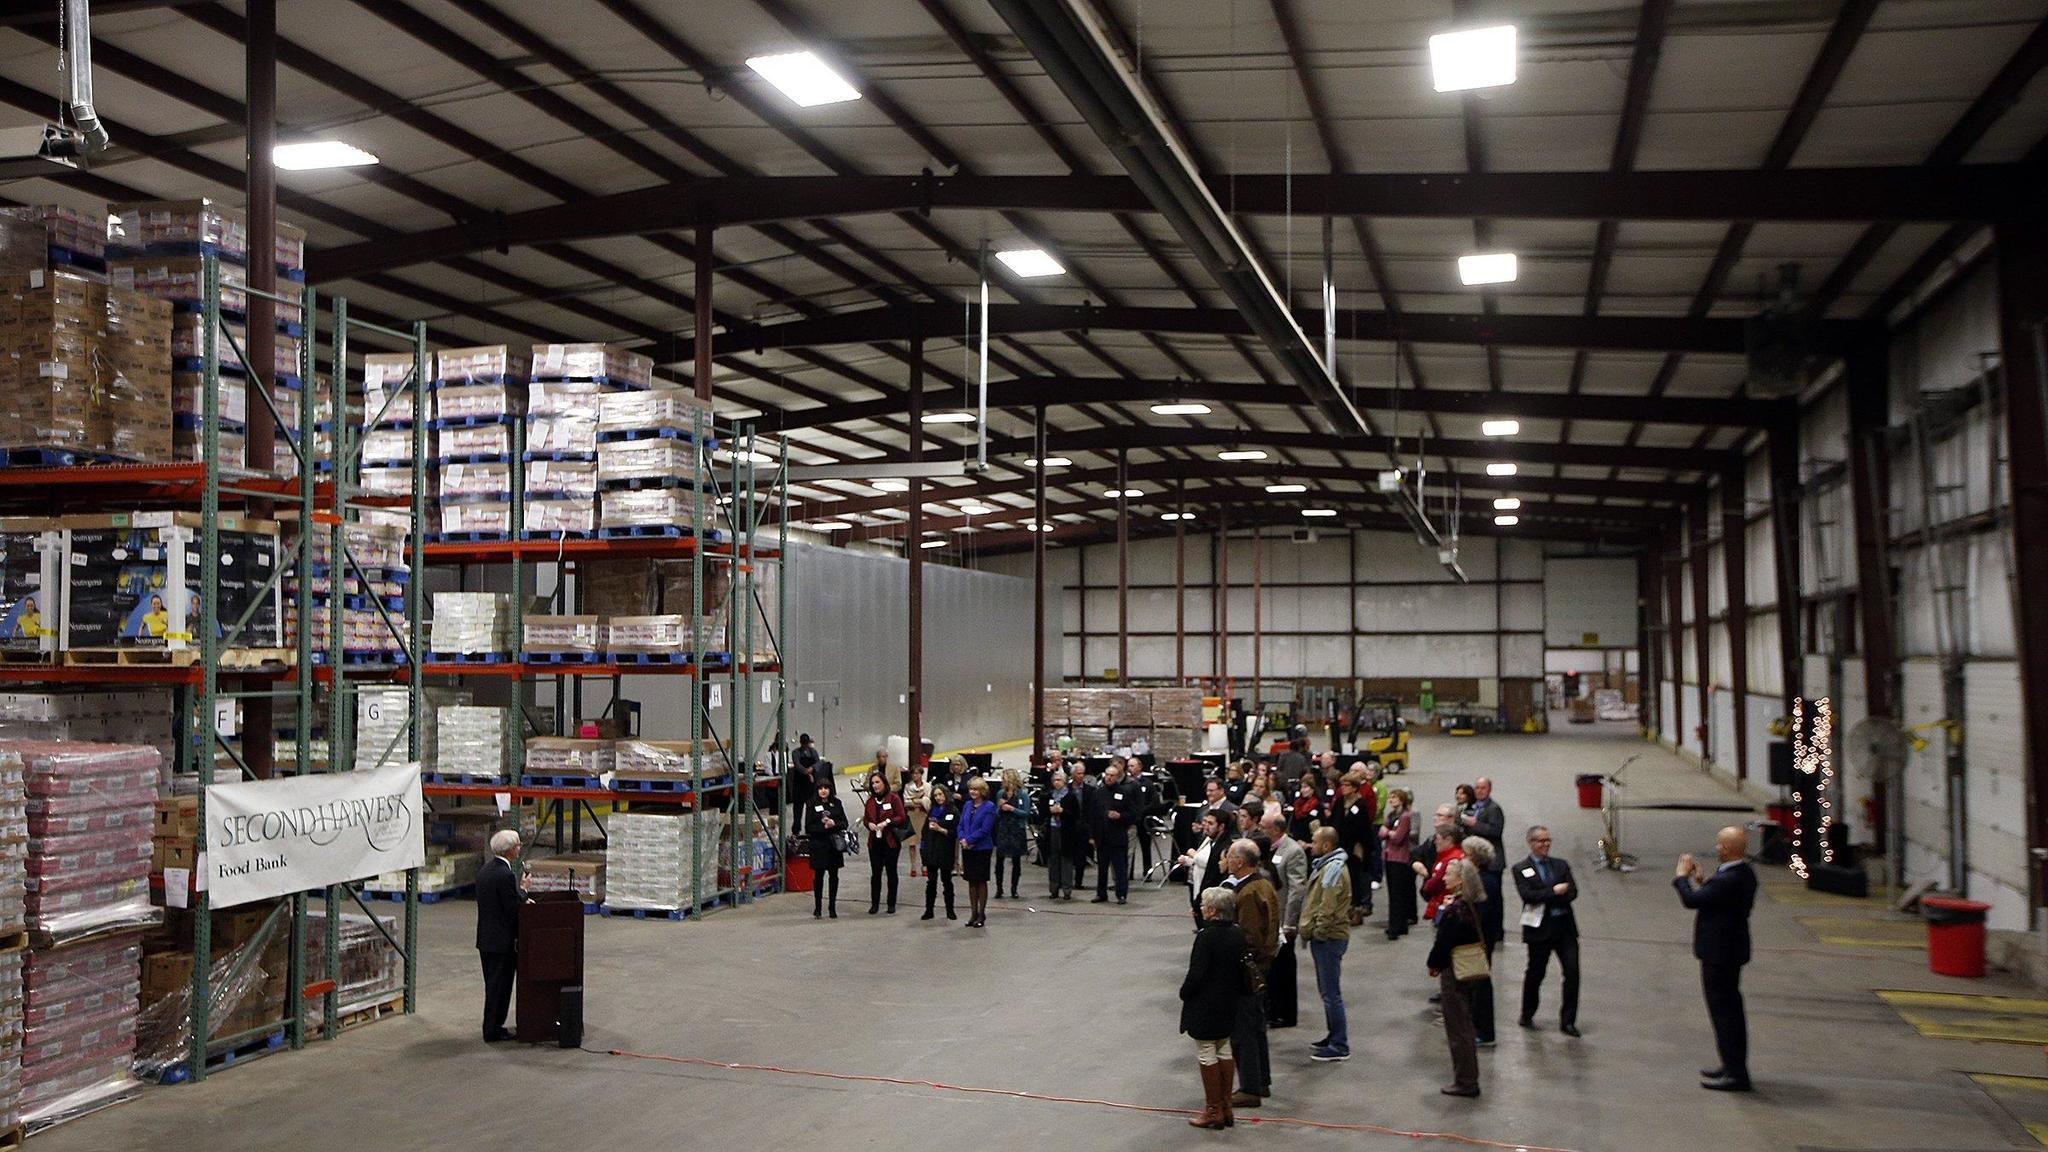 Mission Alert >> Second Harvest Food Bank celebrates capital campaign, undergoes name change - Lehigh Valley ...